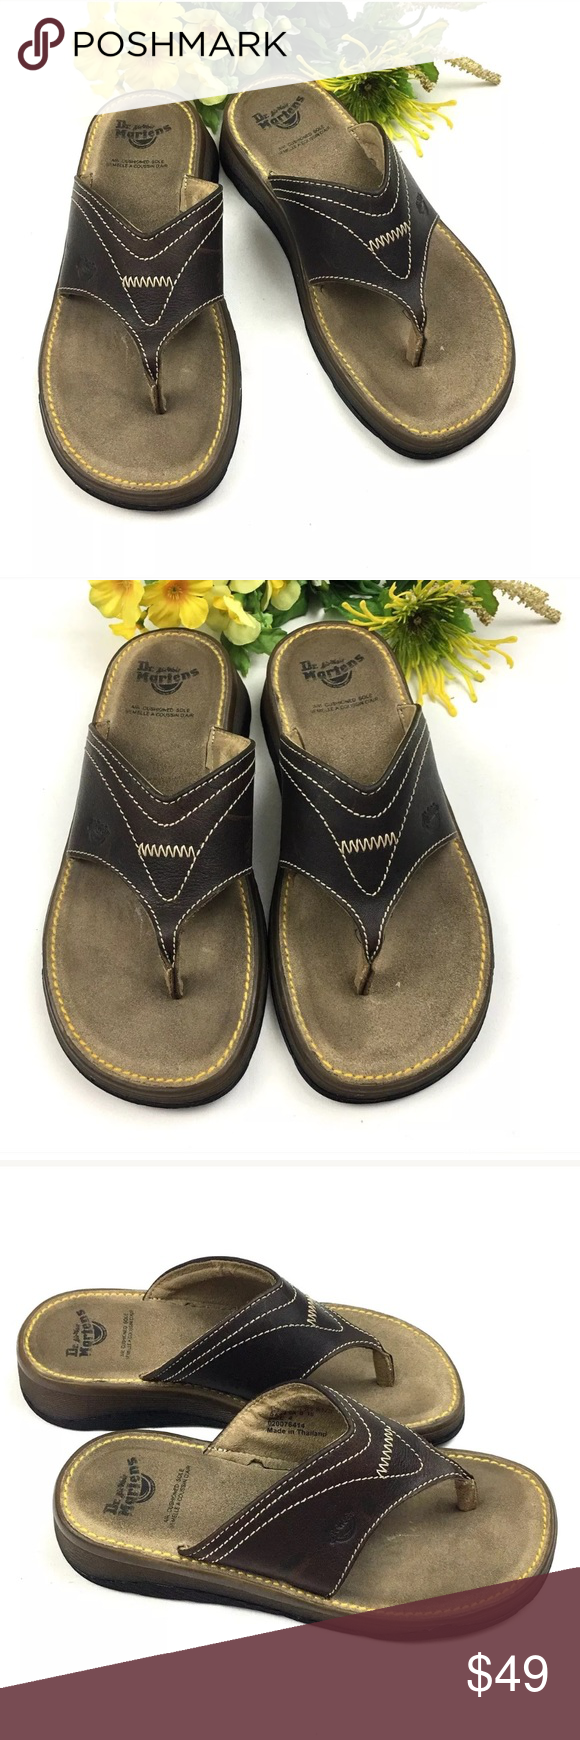 c43f61e1ef9 Dr. Martens Air-Wair Sandals